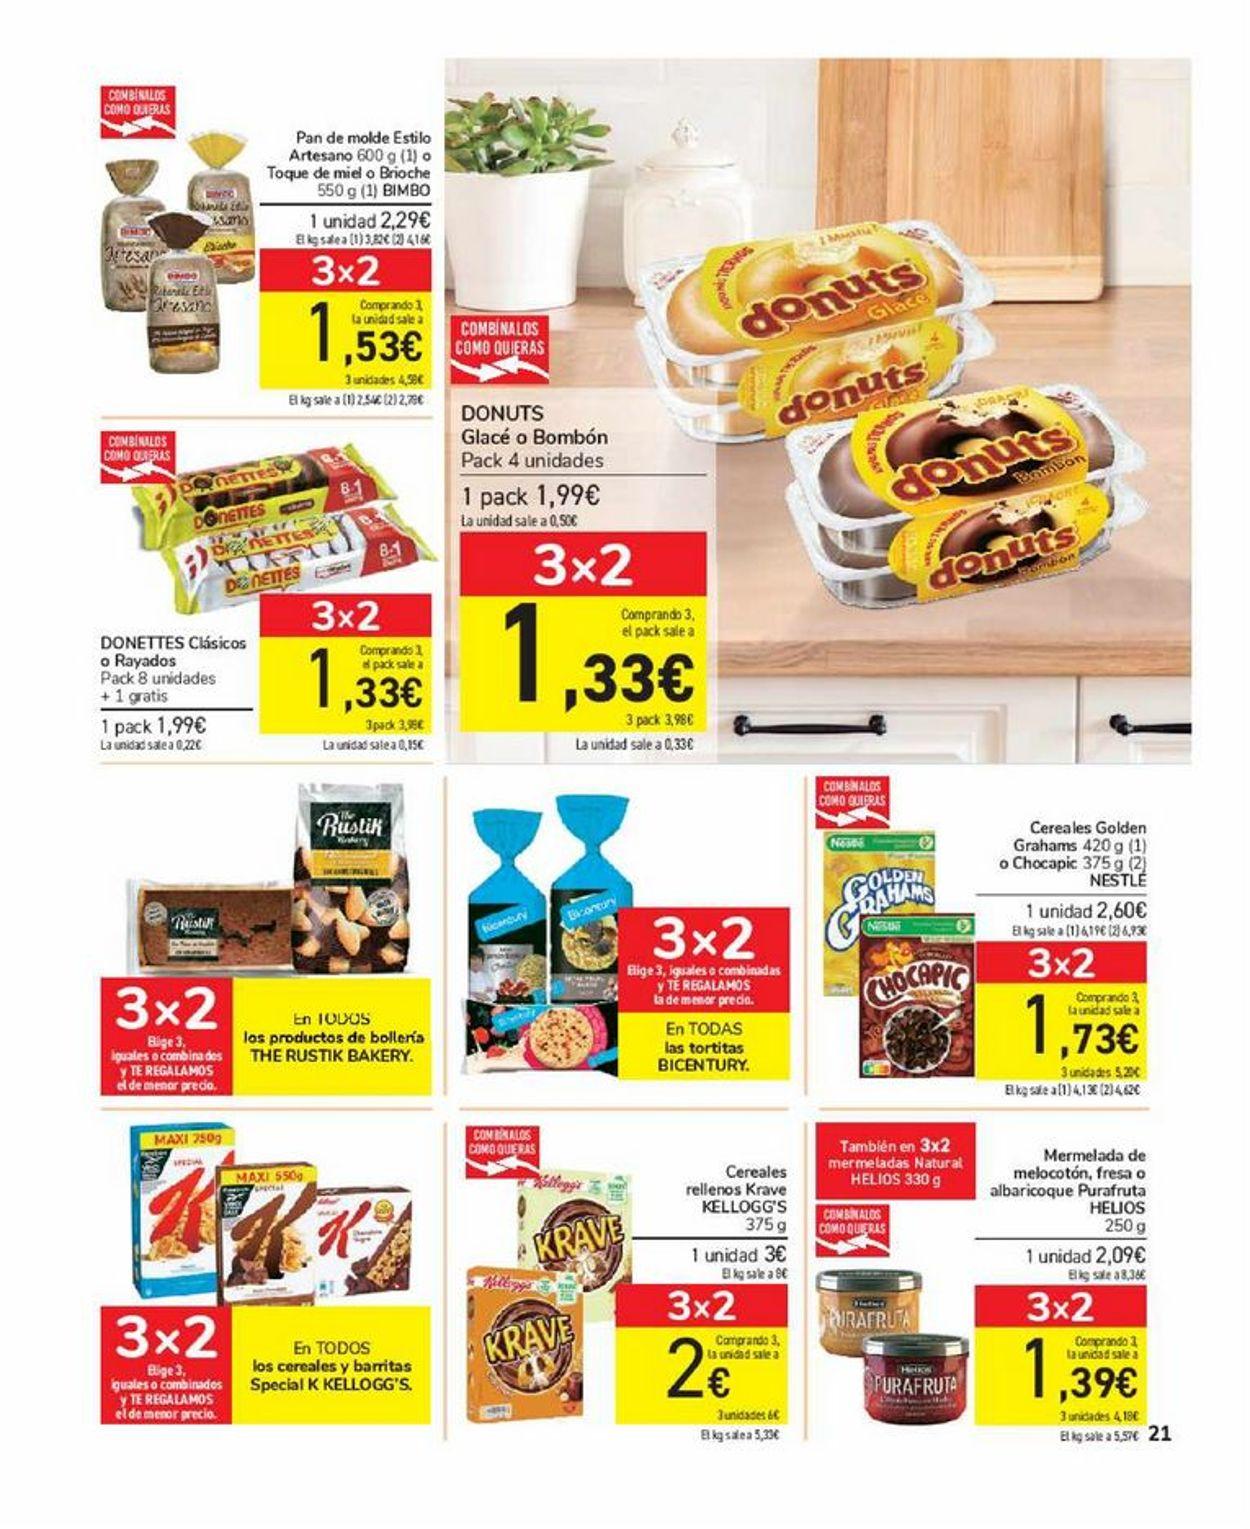 Carrefour Folleto - 17.06-29.06.2021 (Página 21)